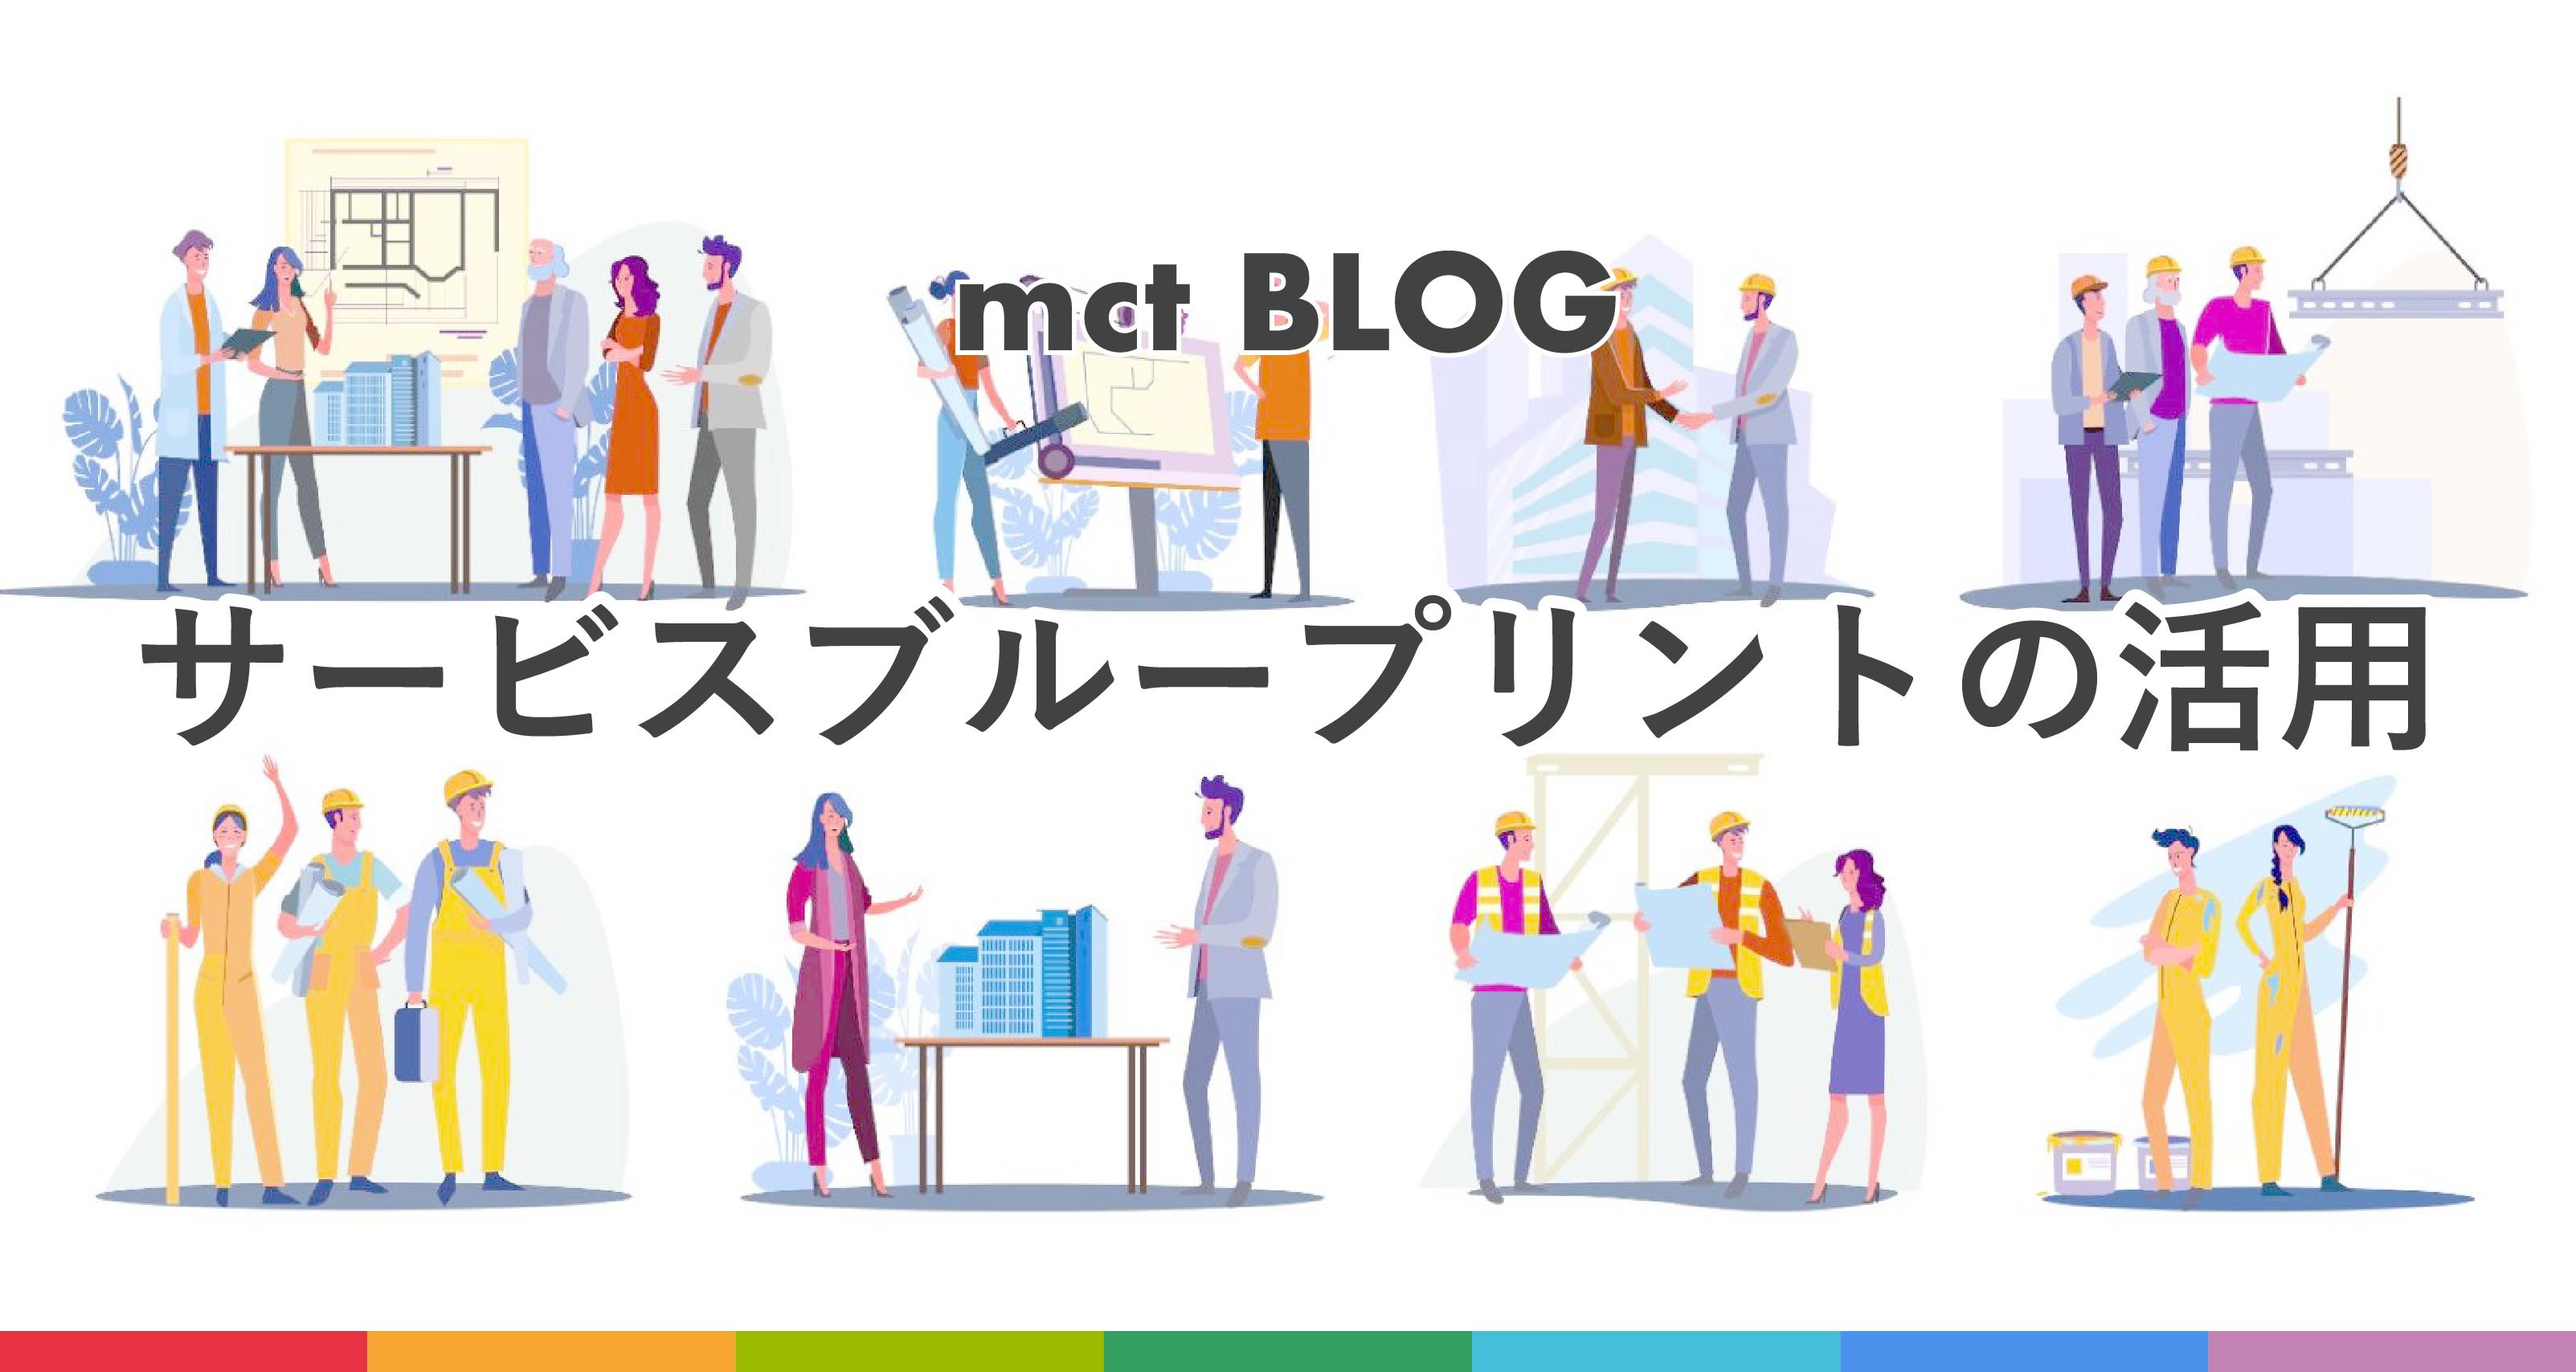 Blog|サービスブループリントの活用